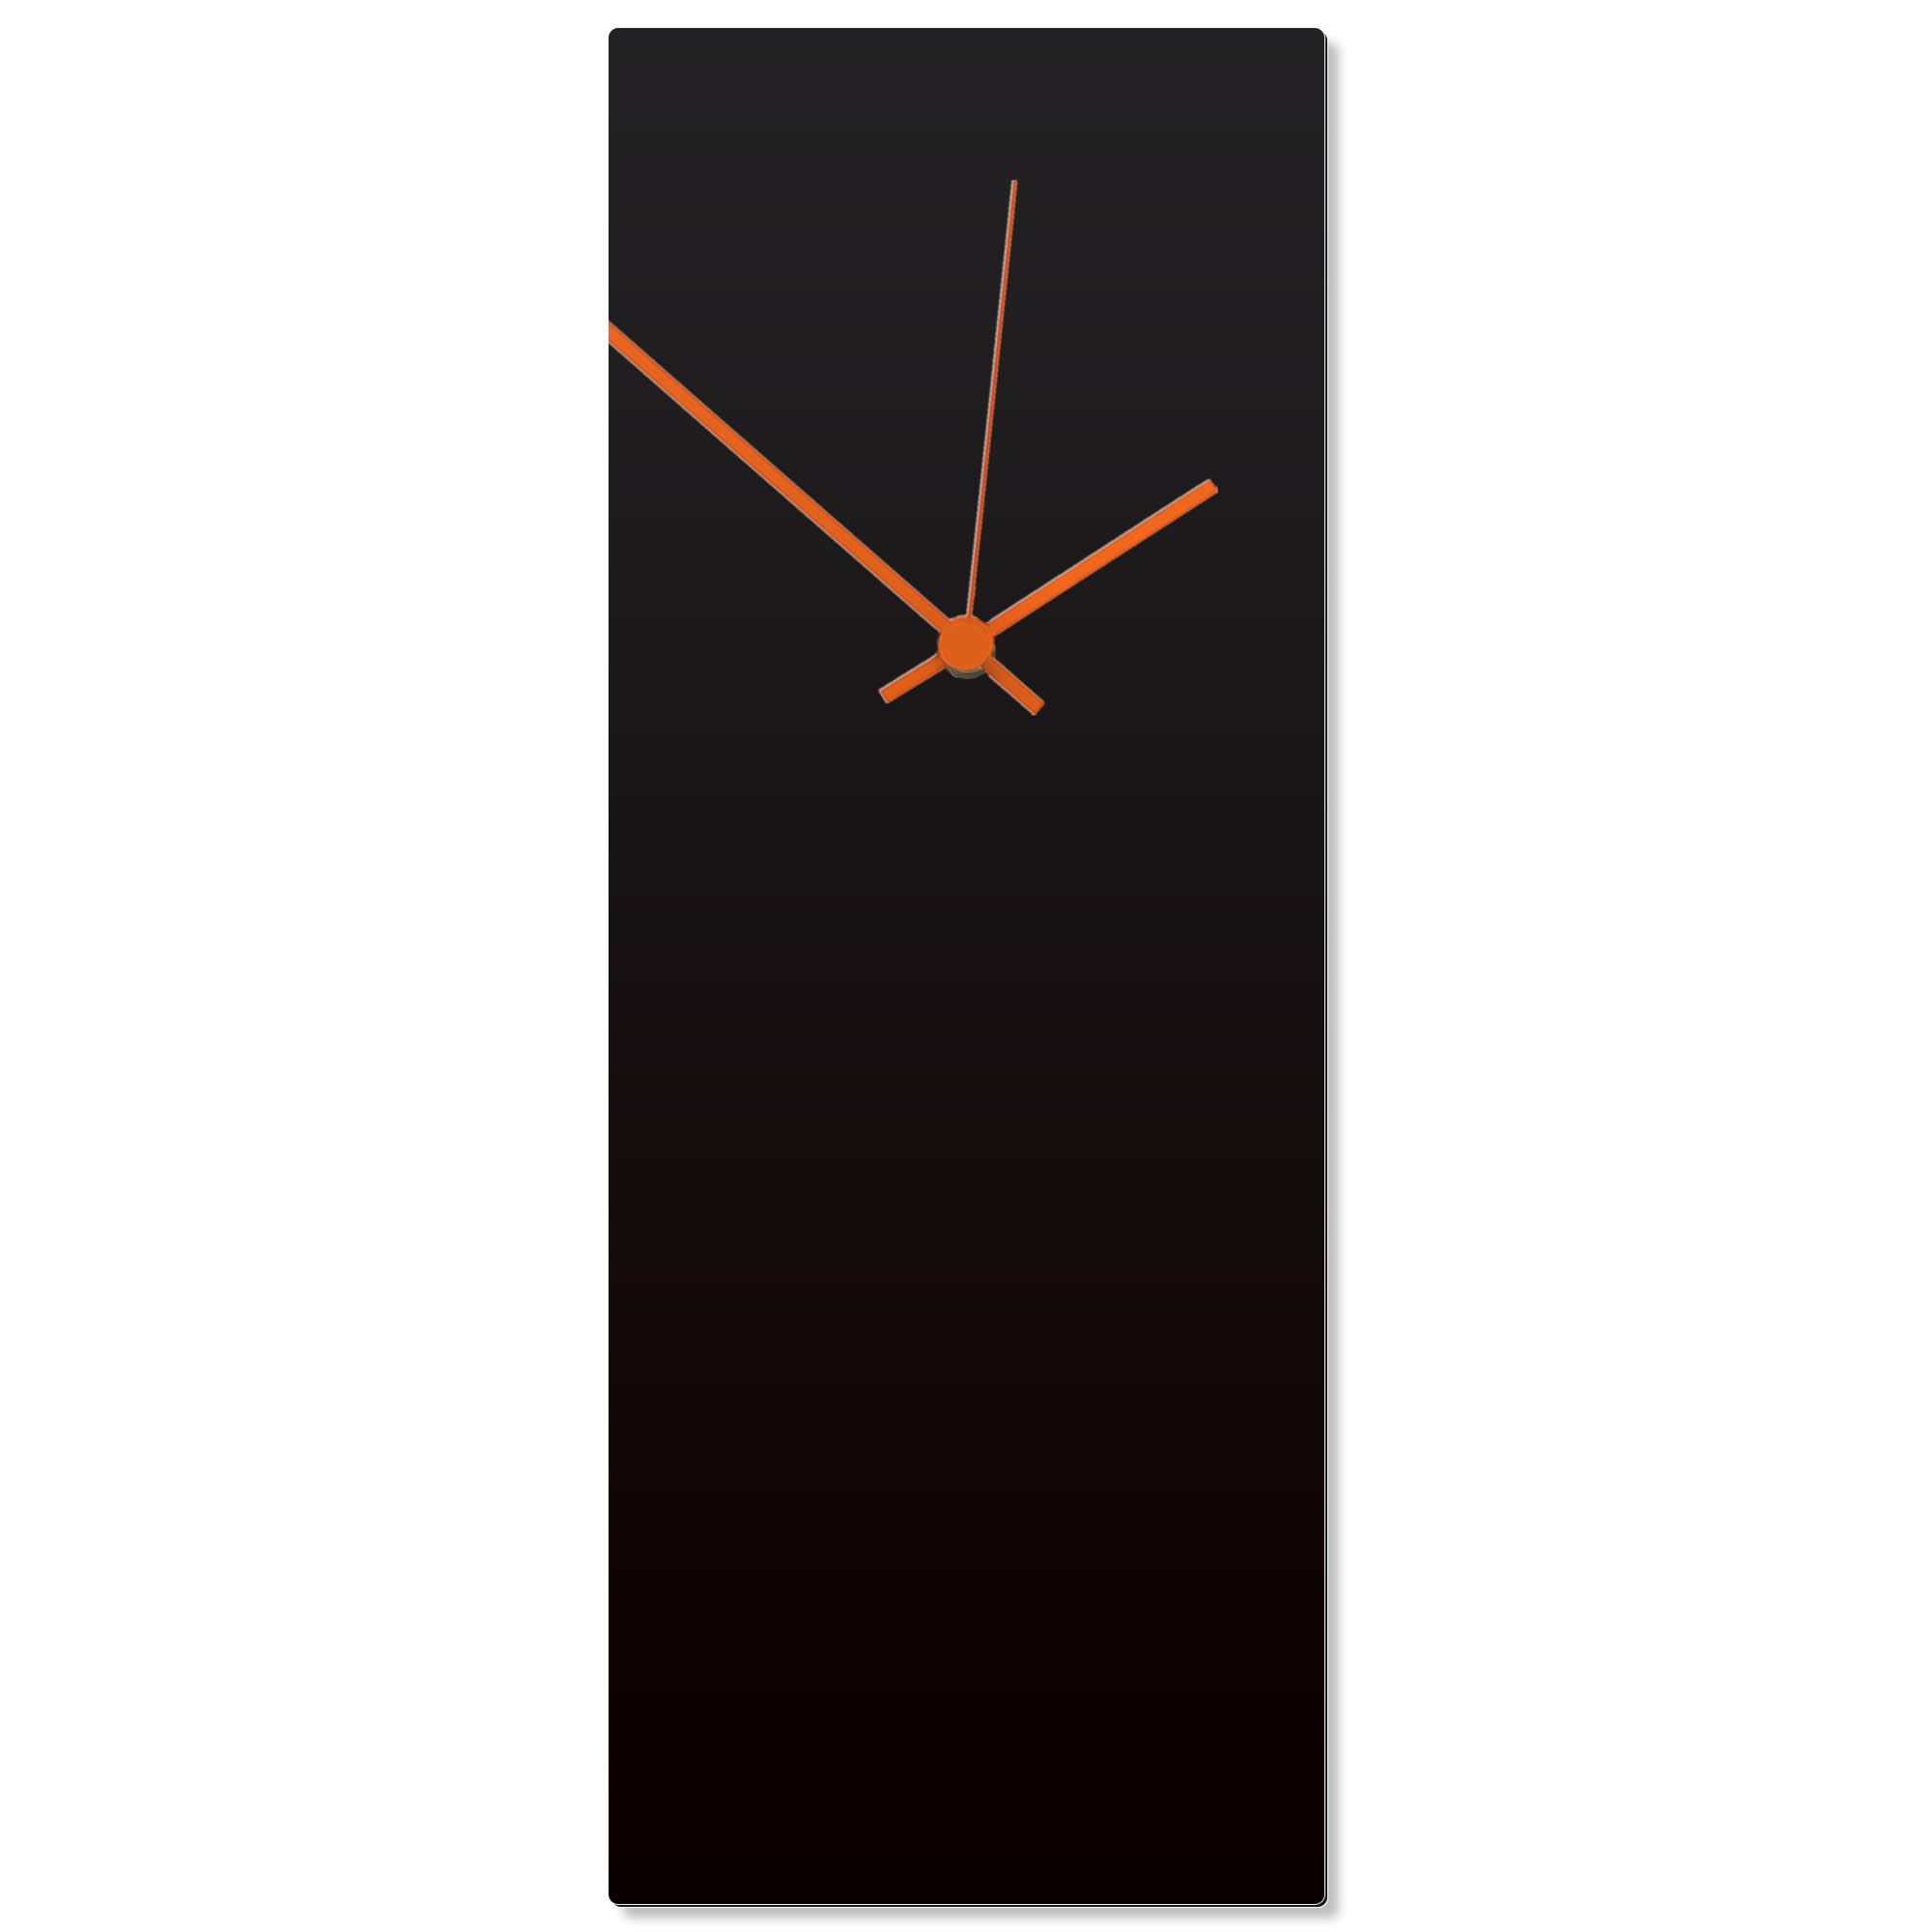 Blackout Orange Clock Large 8.25x22in. Aluminum Polymetal